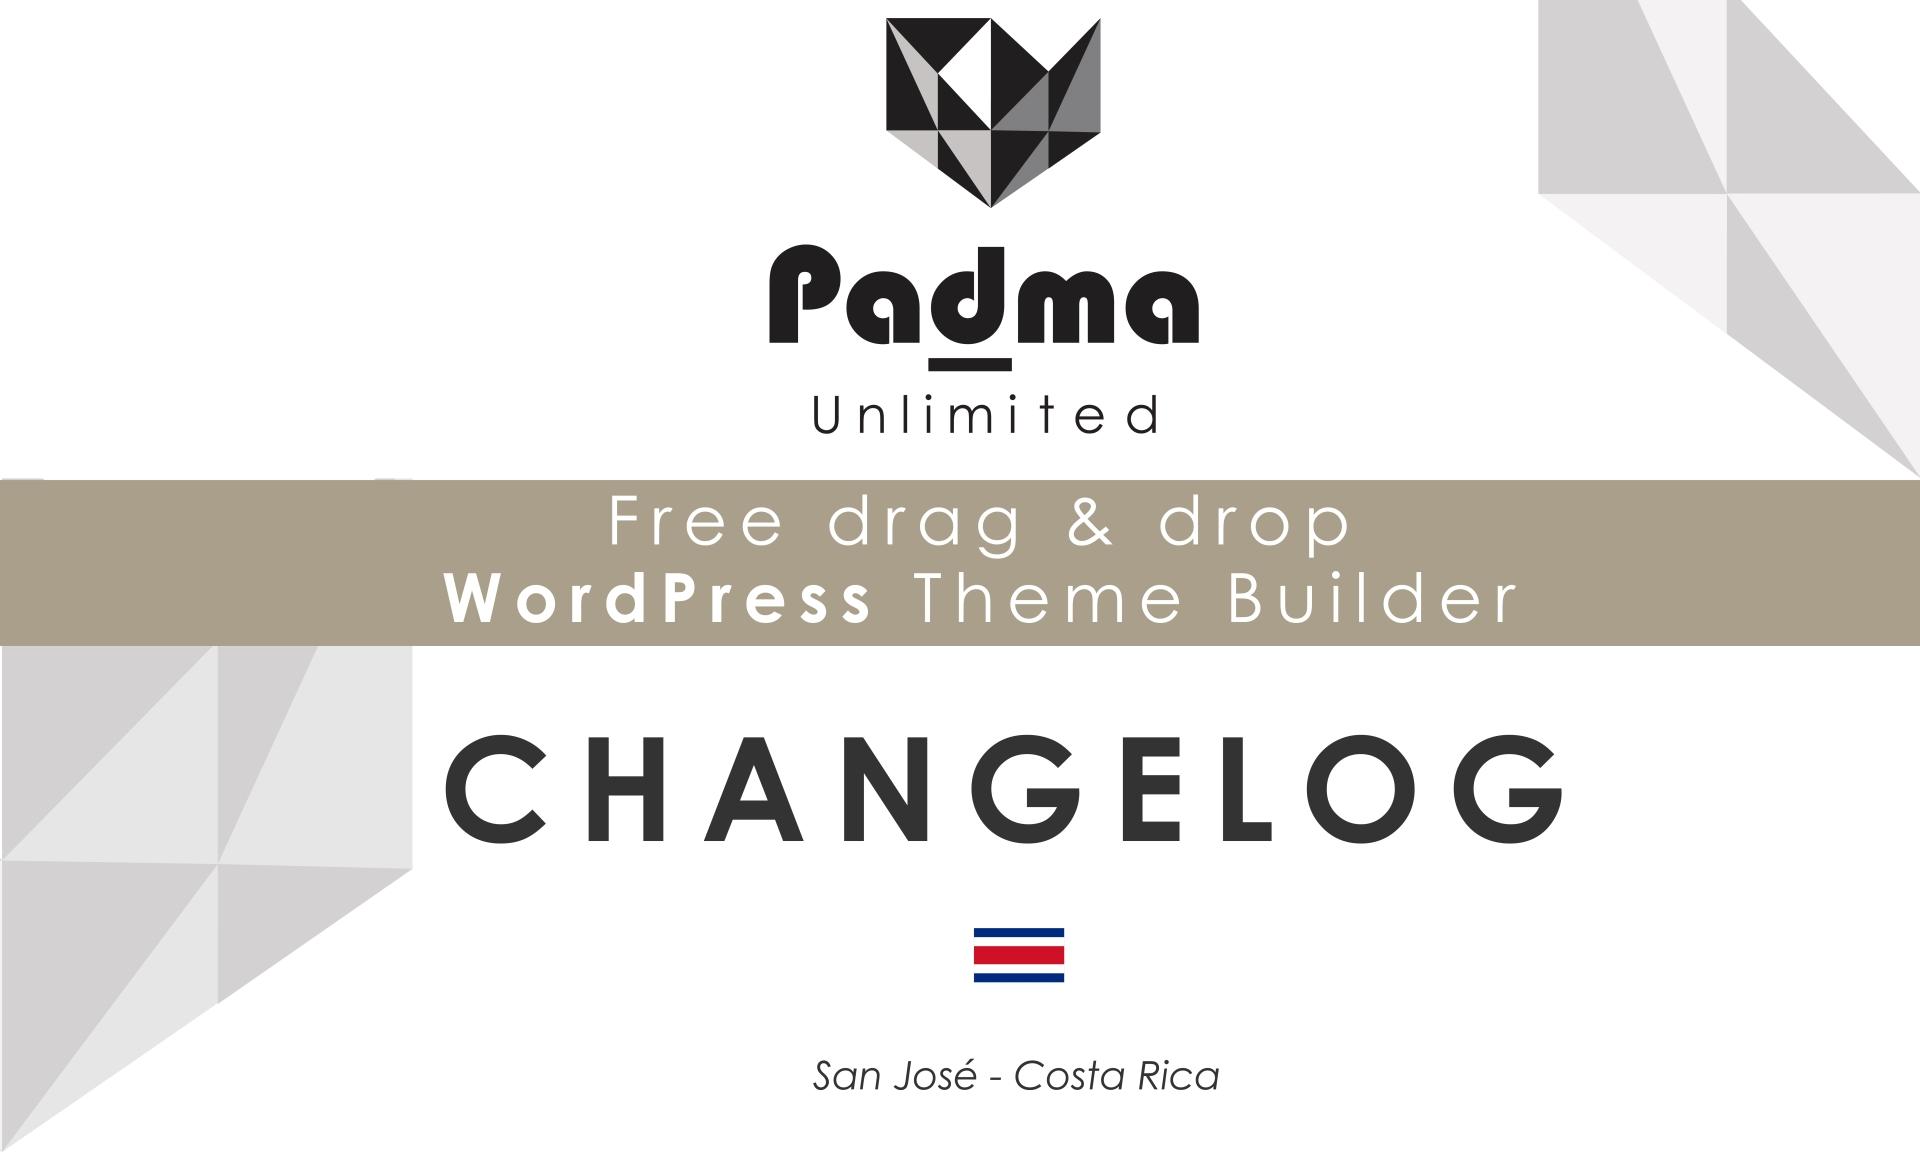 Changelog > Padma | Unlimited